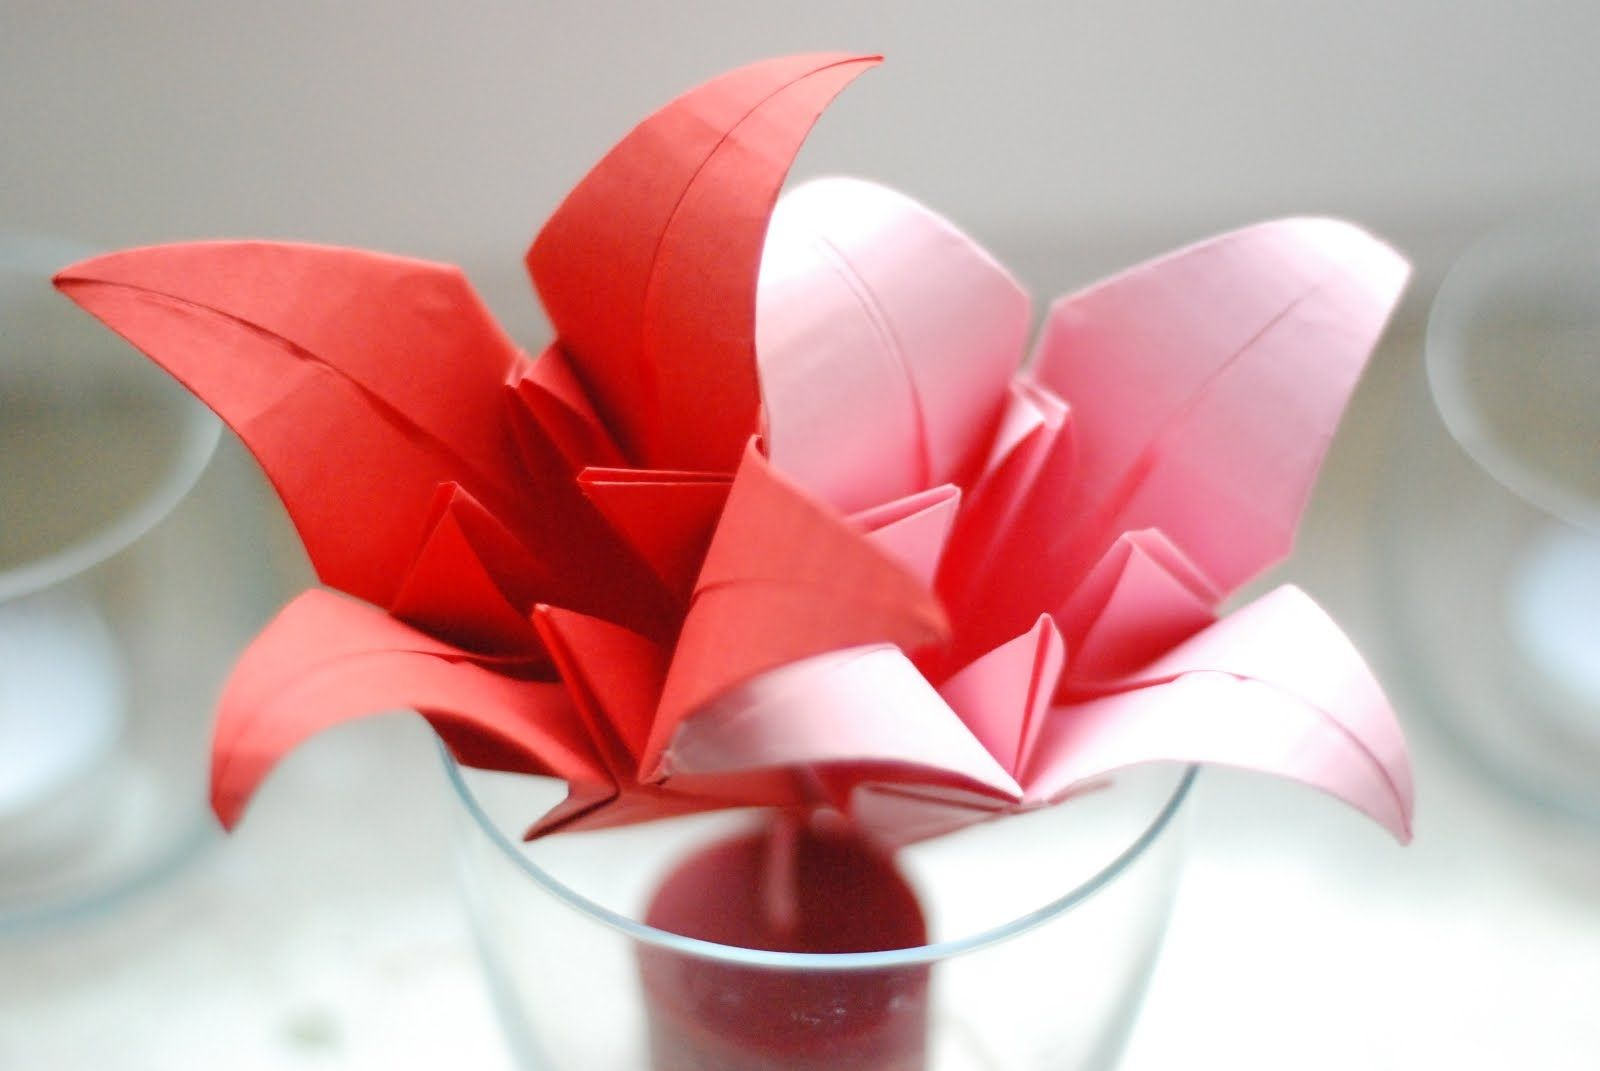 Lilia Origami Instrukcja Instruction Instructions Handmade